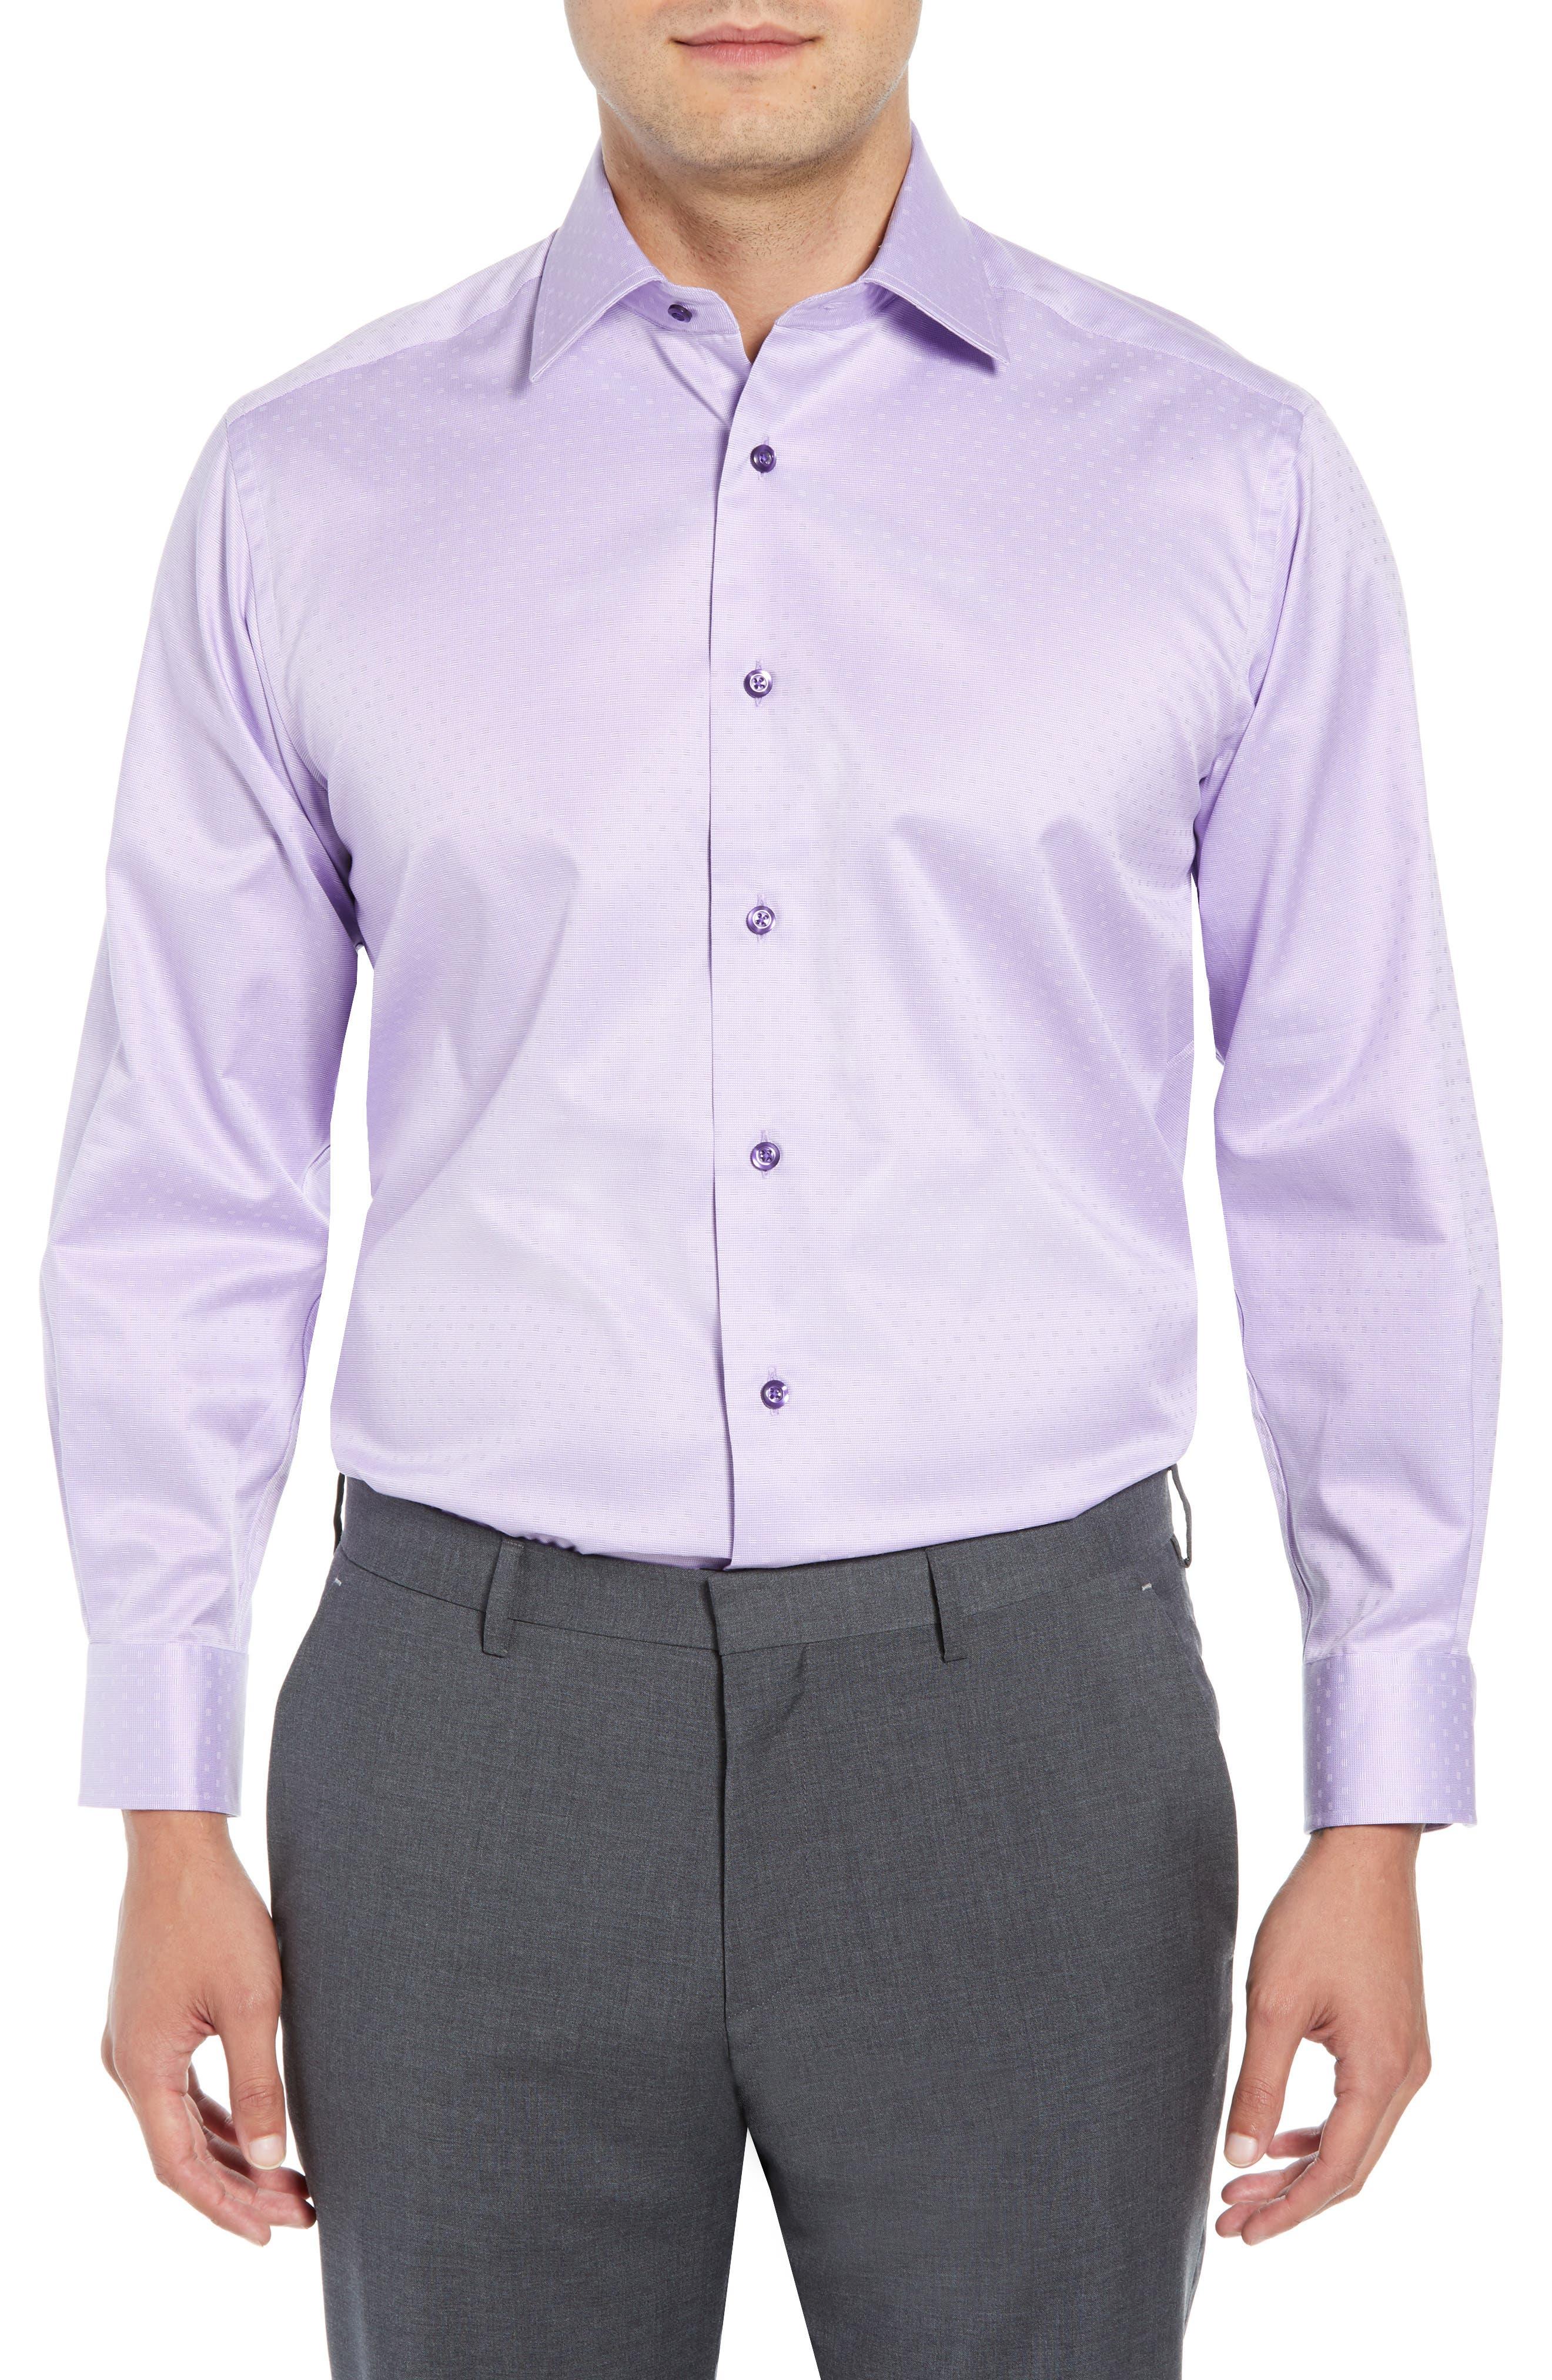 Regular Fit Solid Dress Shirt,                             Main thumbnail 1, color,                             LILAC